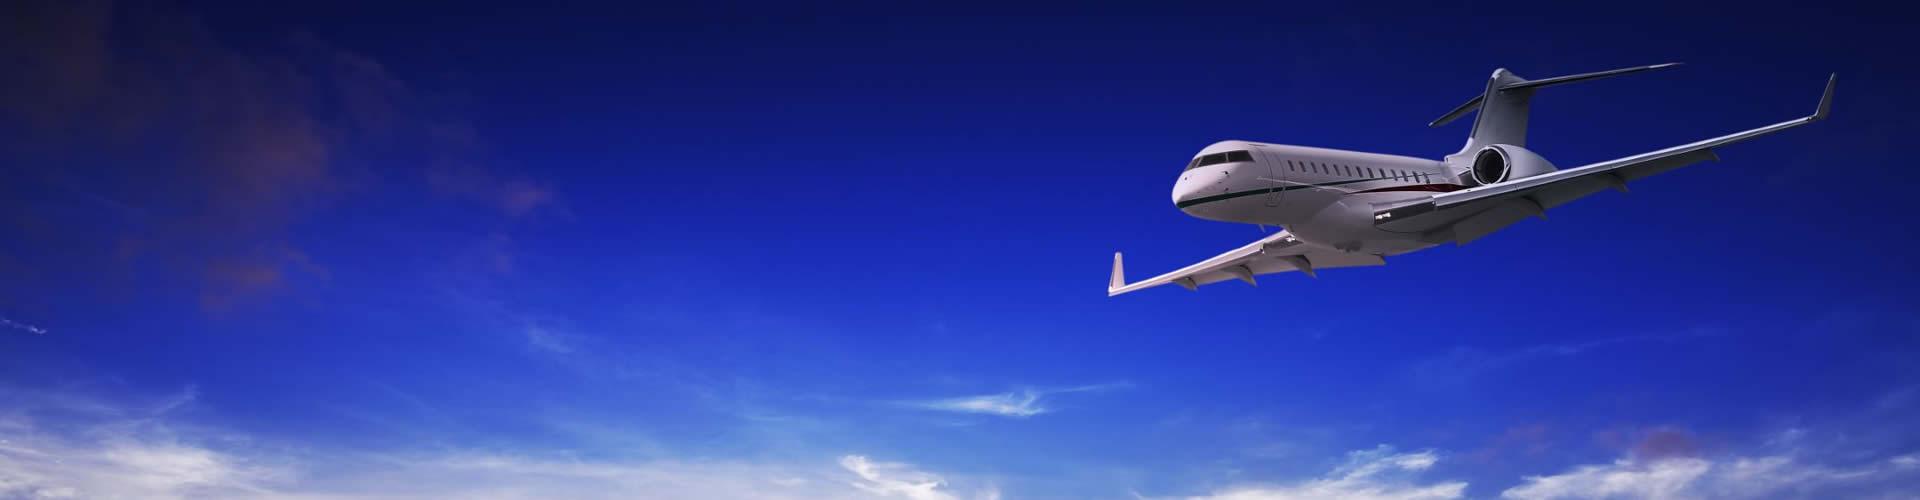 Charter and Aircraft Management